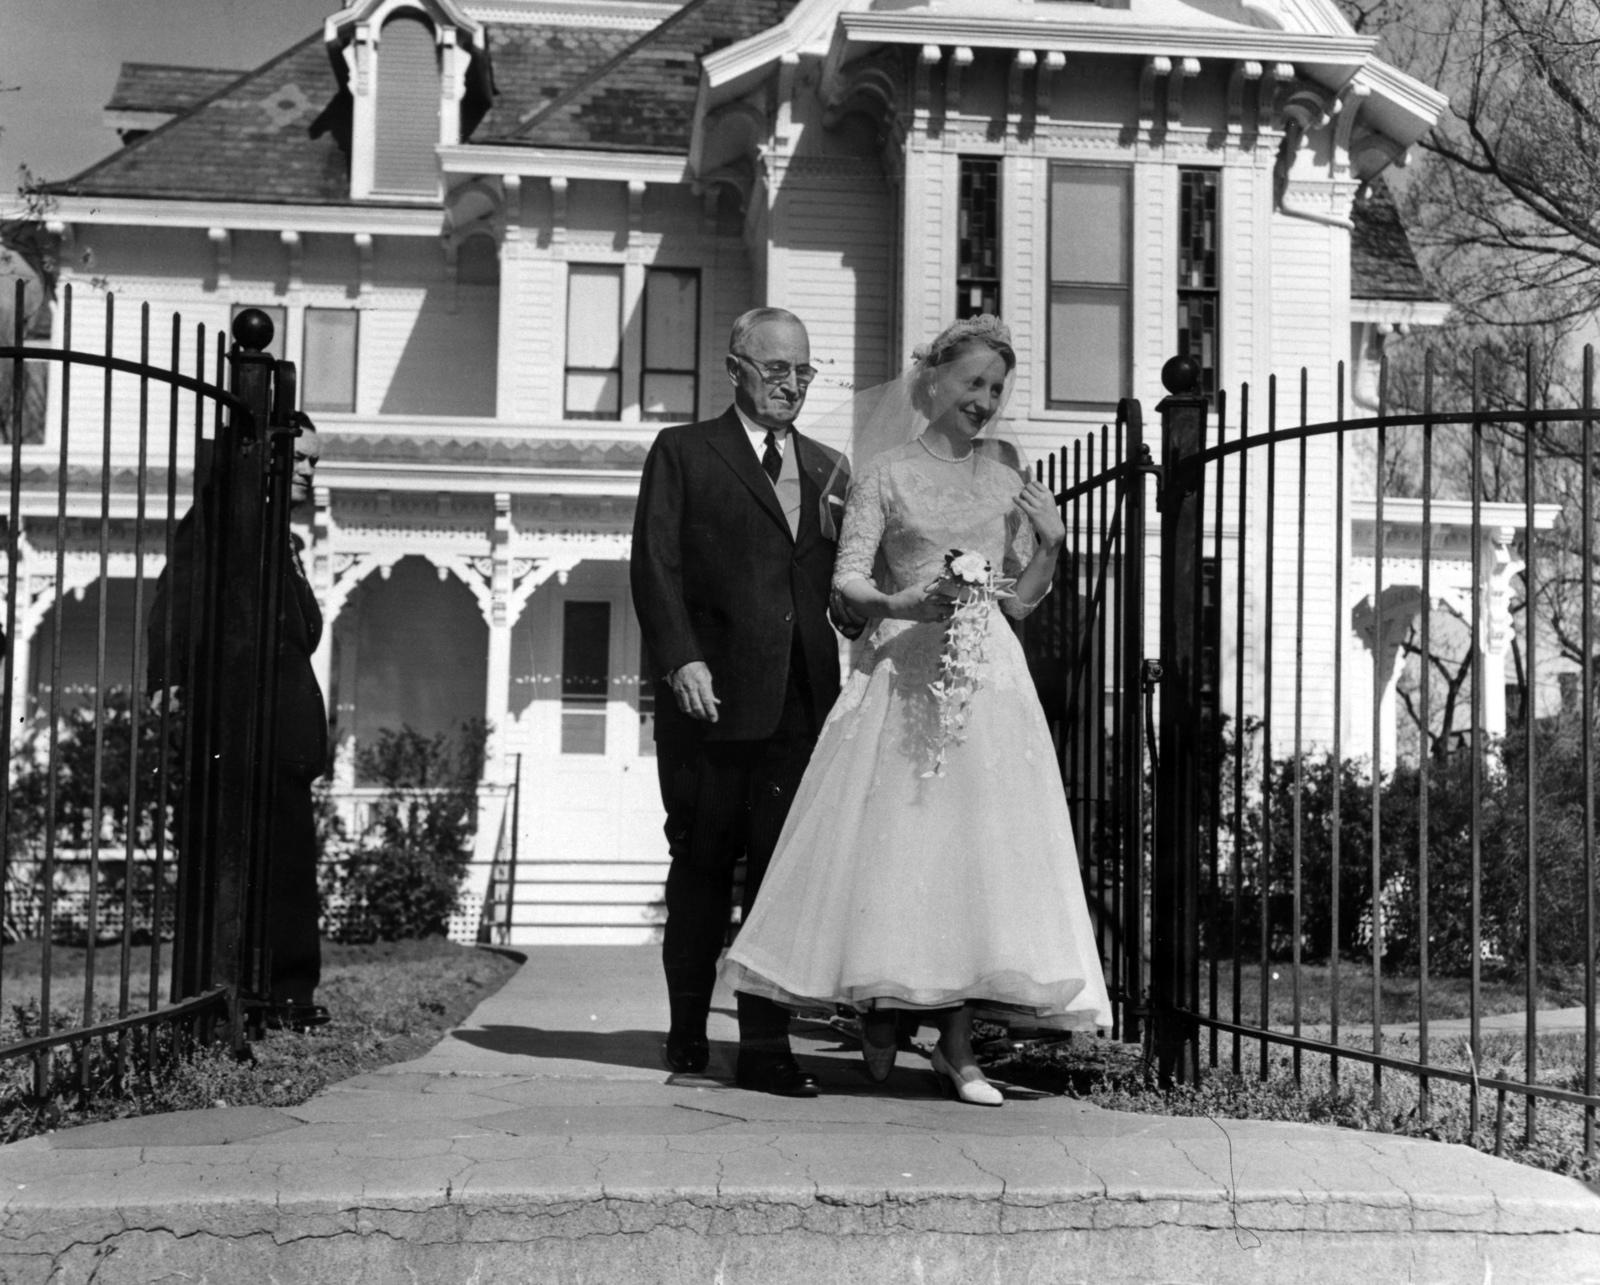 Former-President-Harry-S.-Truman-Escorts-Daughter-Margaret-in-Her-Wedding-Dress